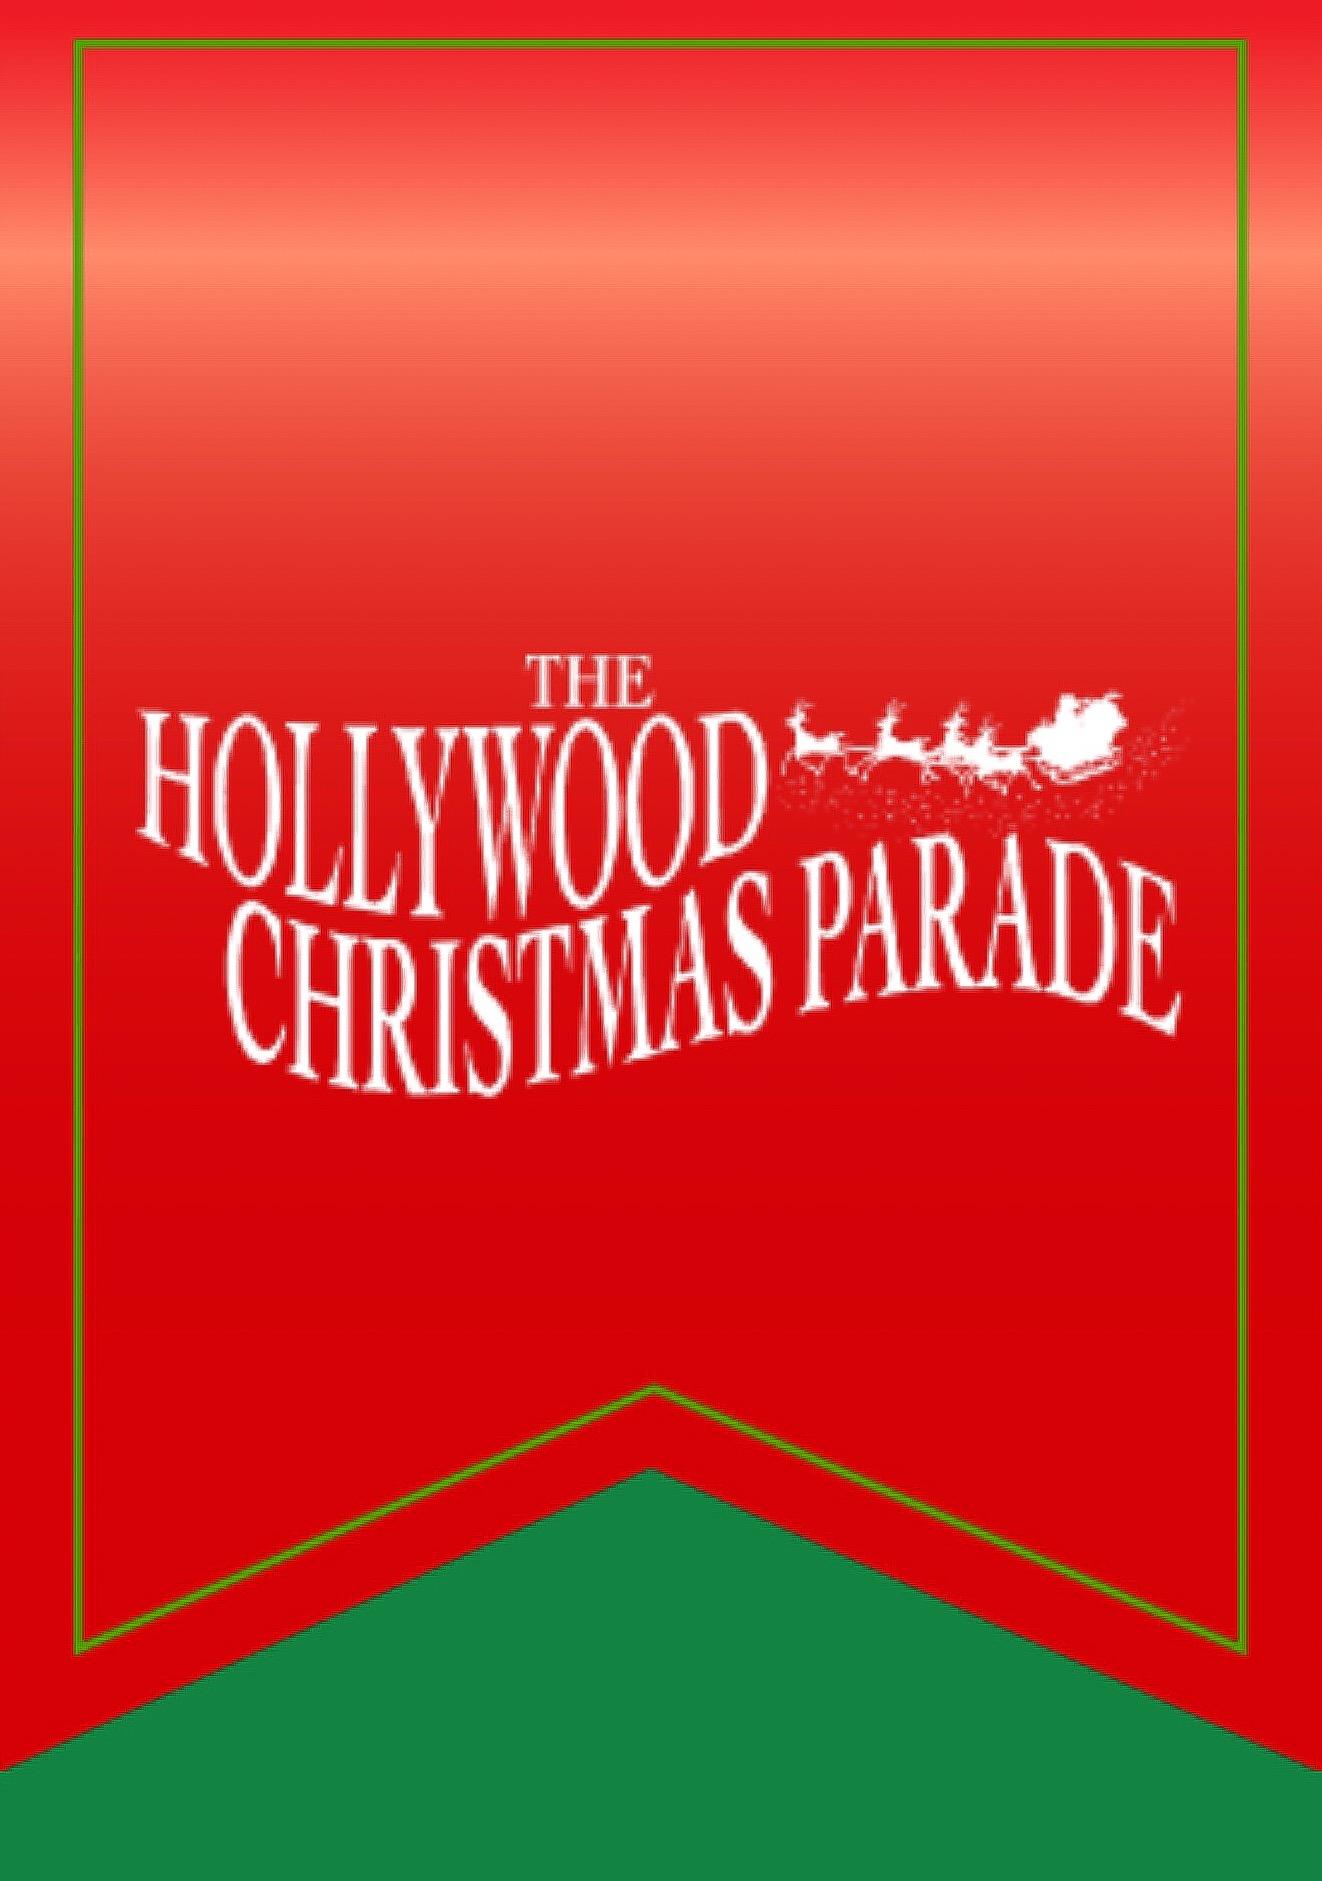 Hollywood Christmas Parade.87th Annual Hollywood Christmas Parade 2018 Imdb